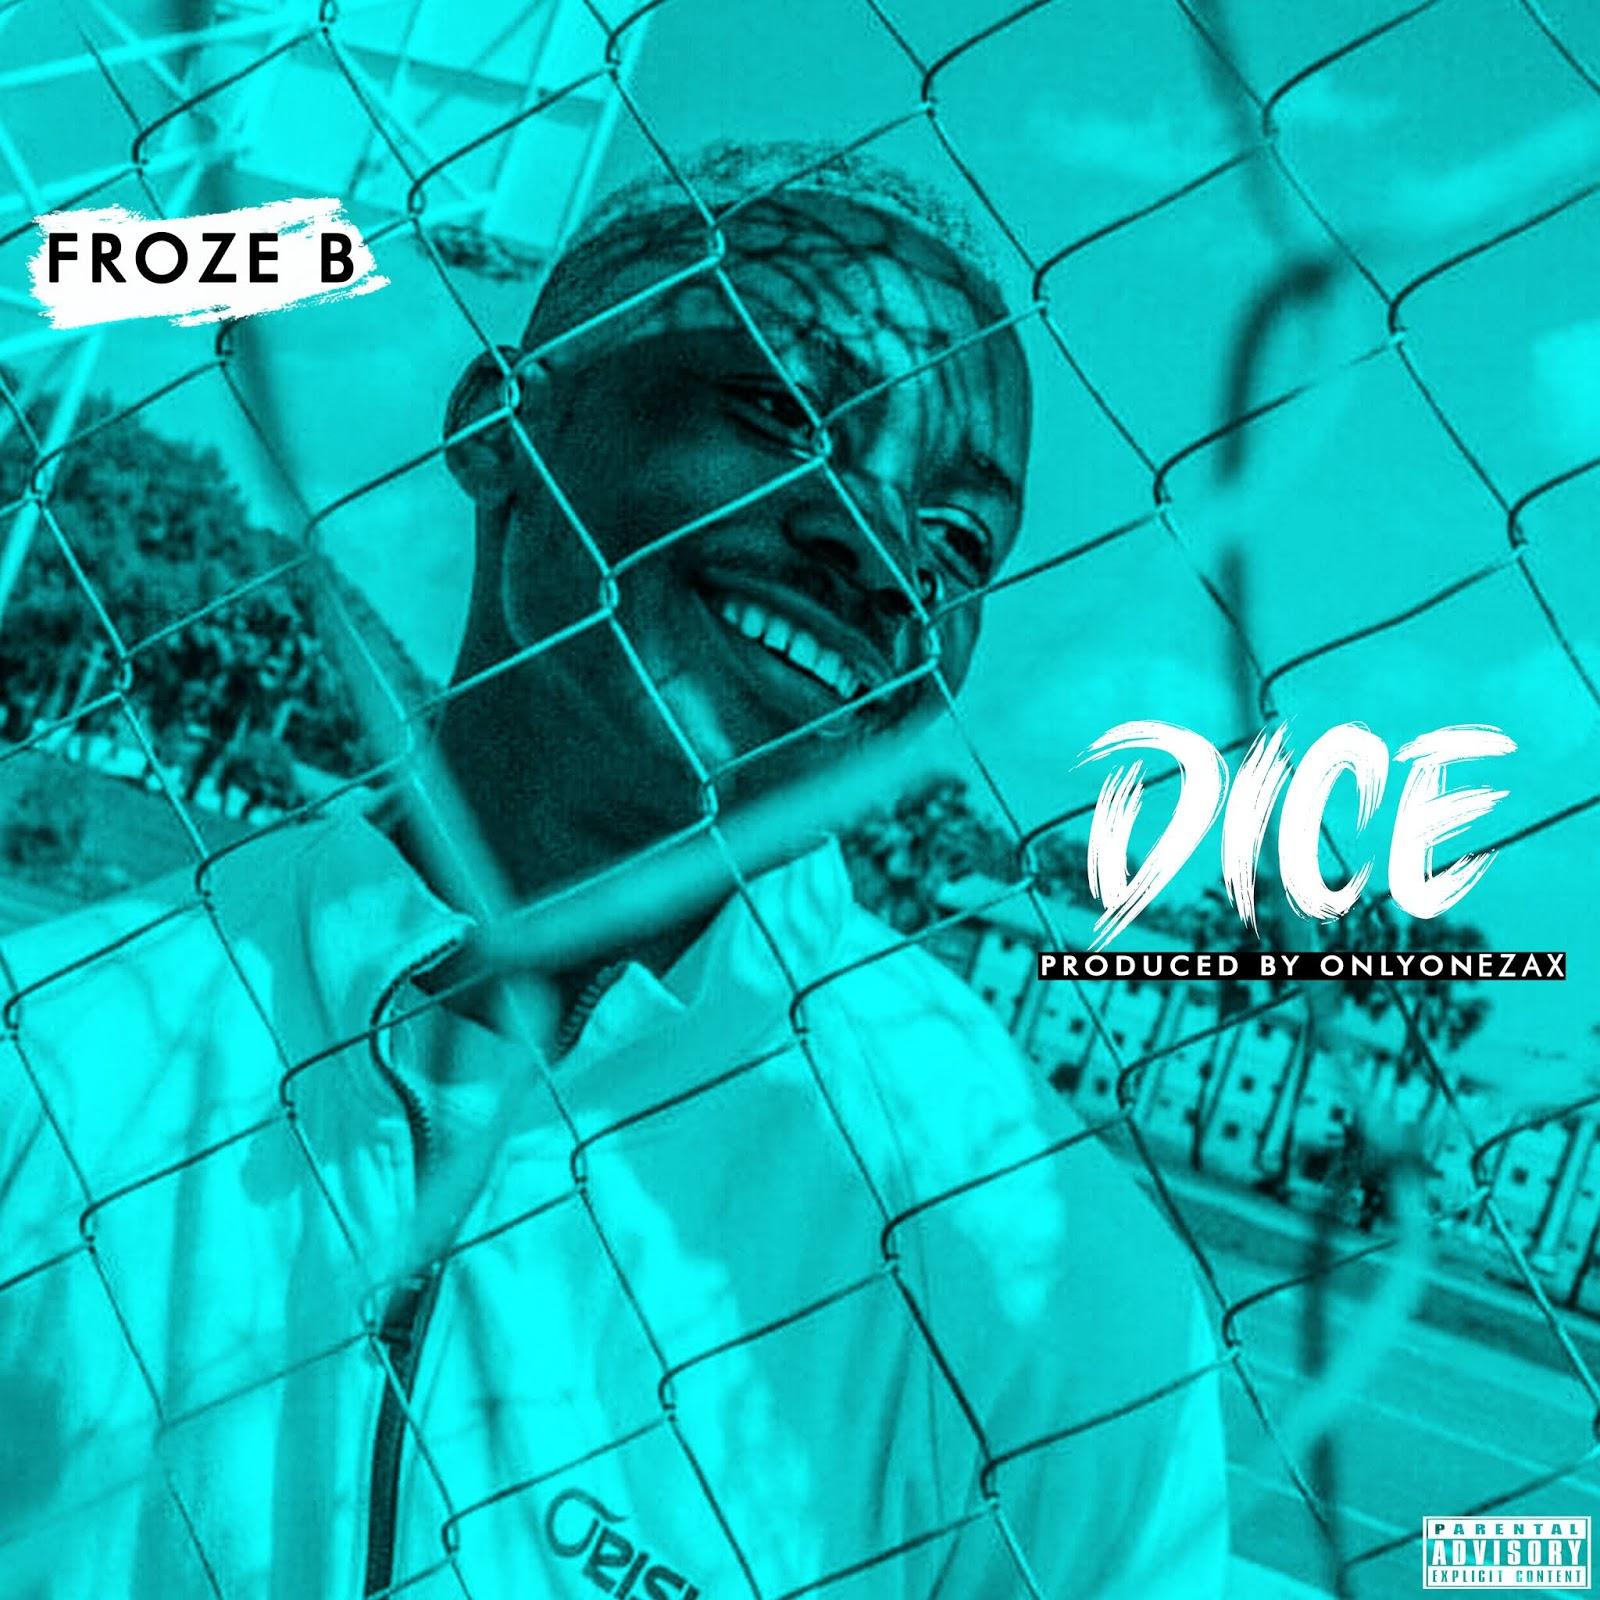 [MUSIQ] Froze B - Dice (Prod. OnlyOneZax)    MP3 Download